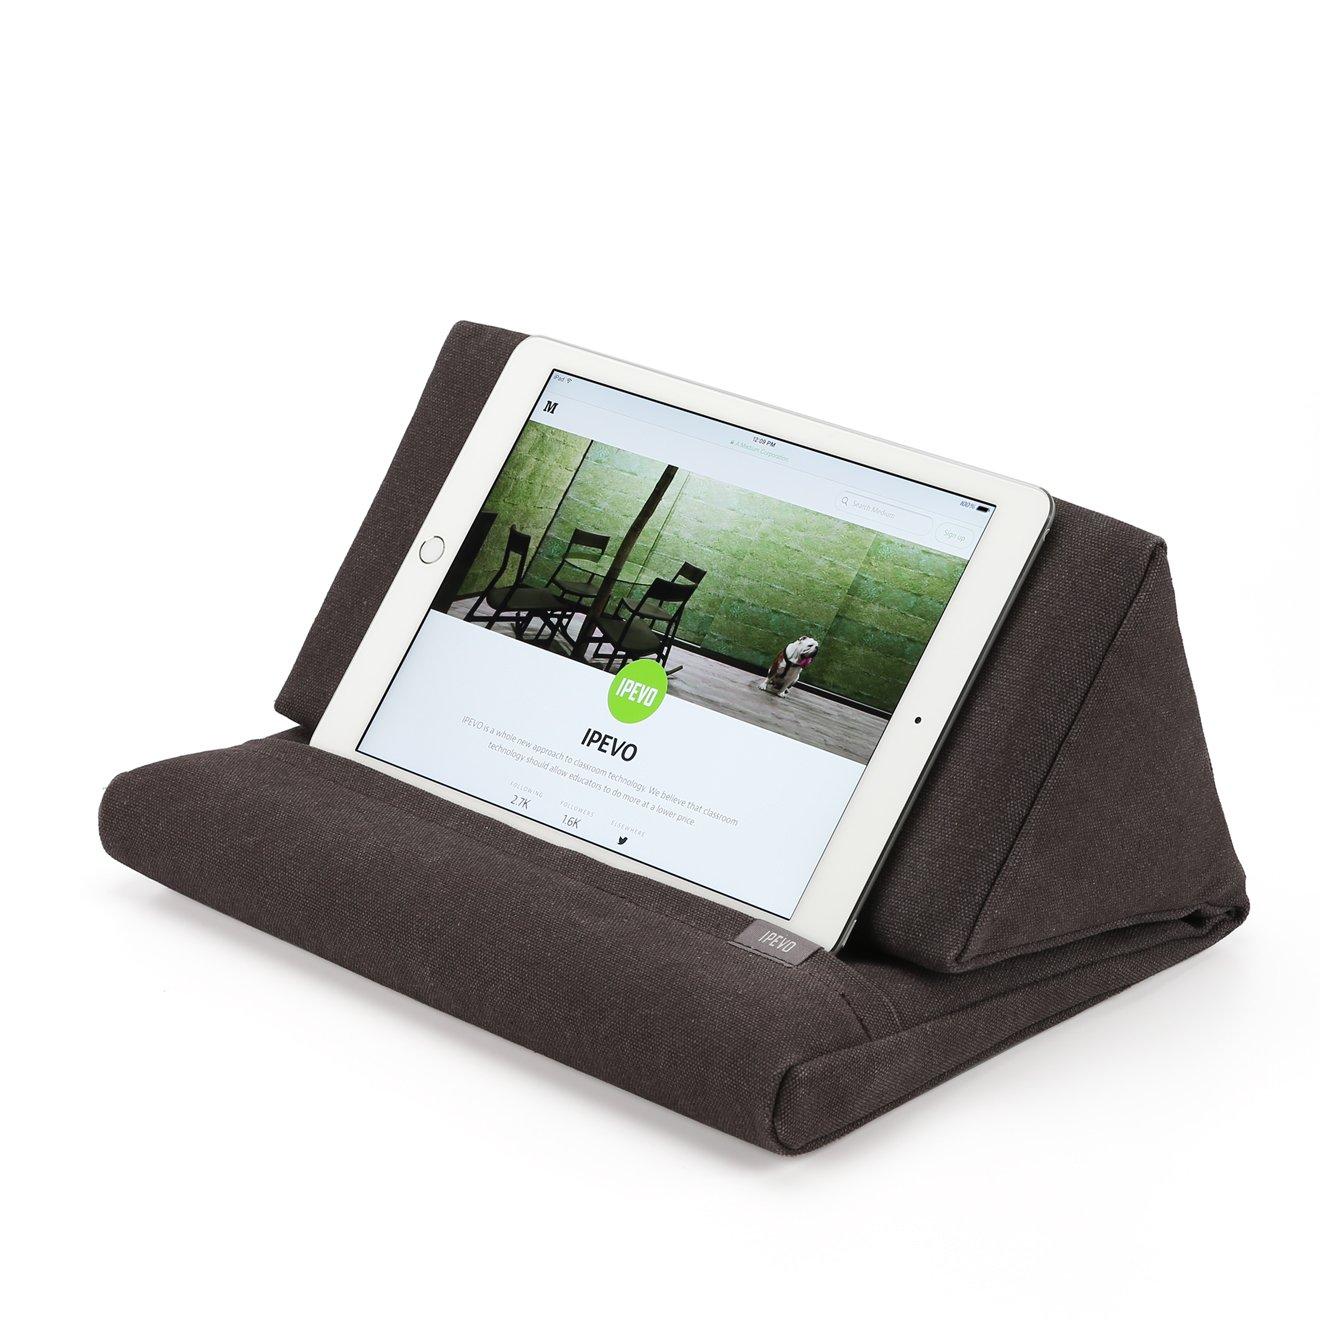 Ipevo PadPillow Stand for iPad Air & iPad 4/3/2/1Nexus/Galaxy - Charcoal Gray (MEPX-07IP)